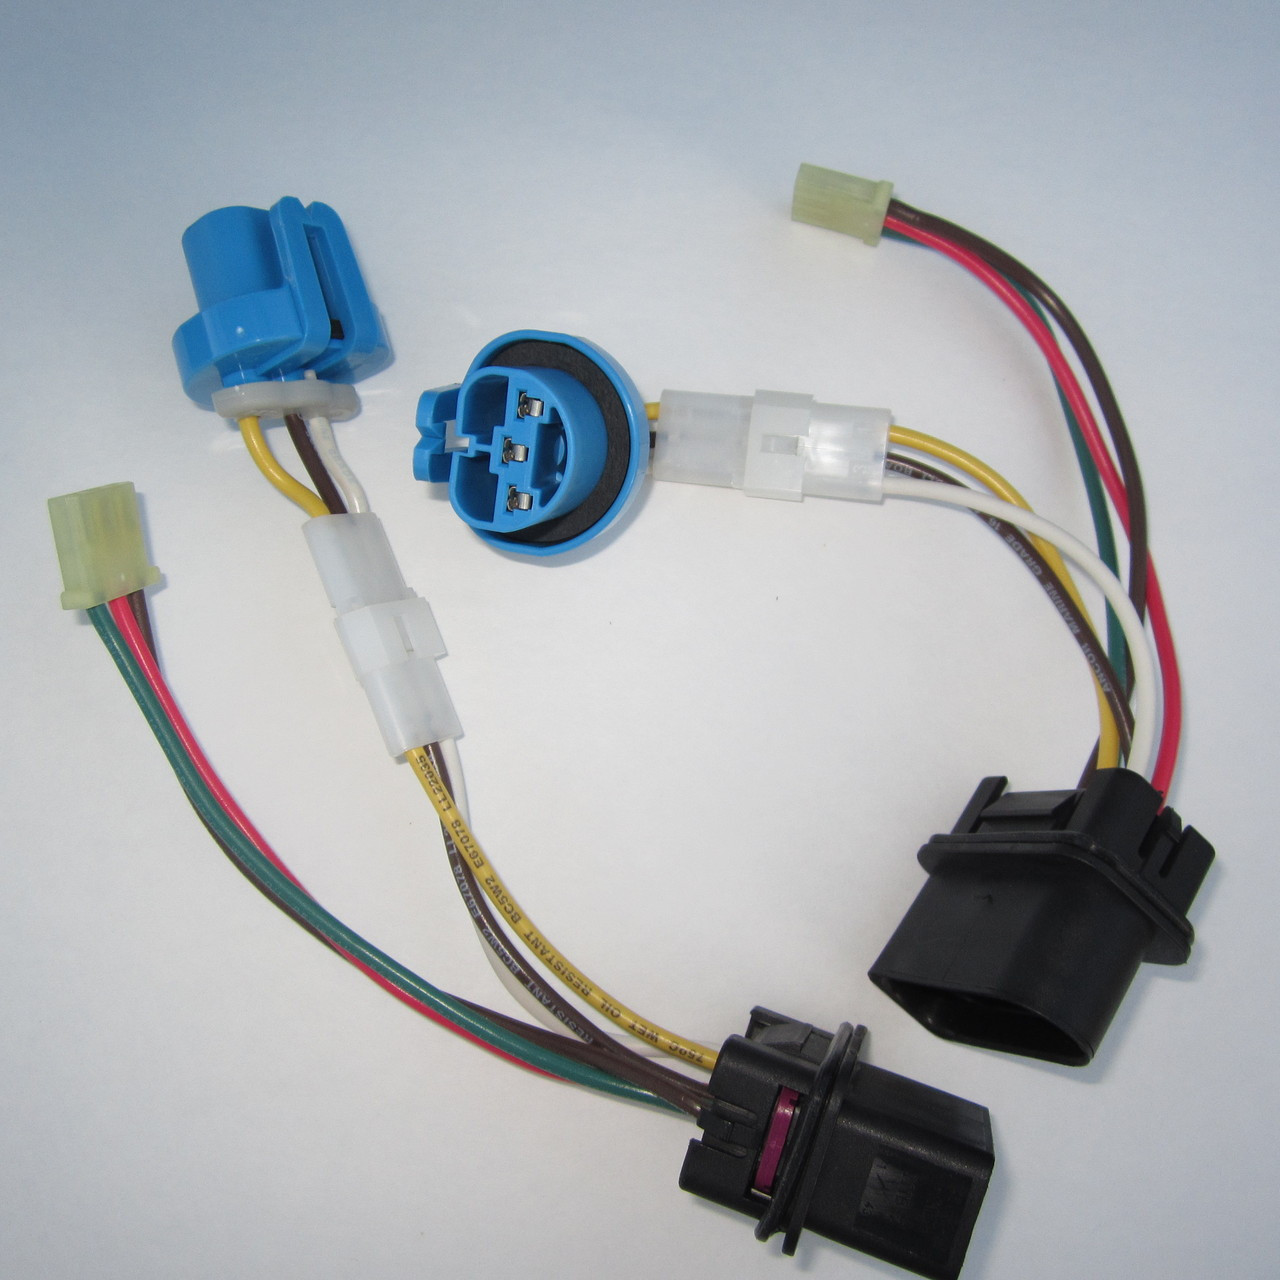 1999 Vw Jetta Headlight Harness Radio Wiring Diagram \u2022 2005 VW Jetta  Wiring Diagram 99 Jetta Headlight Wiring Diagram